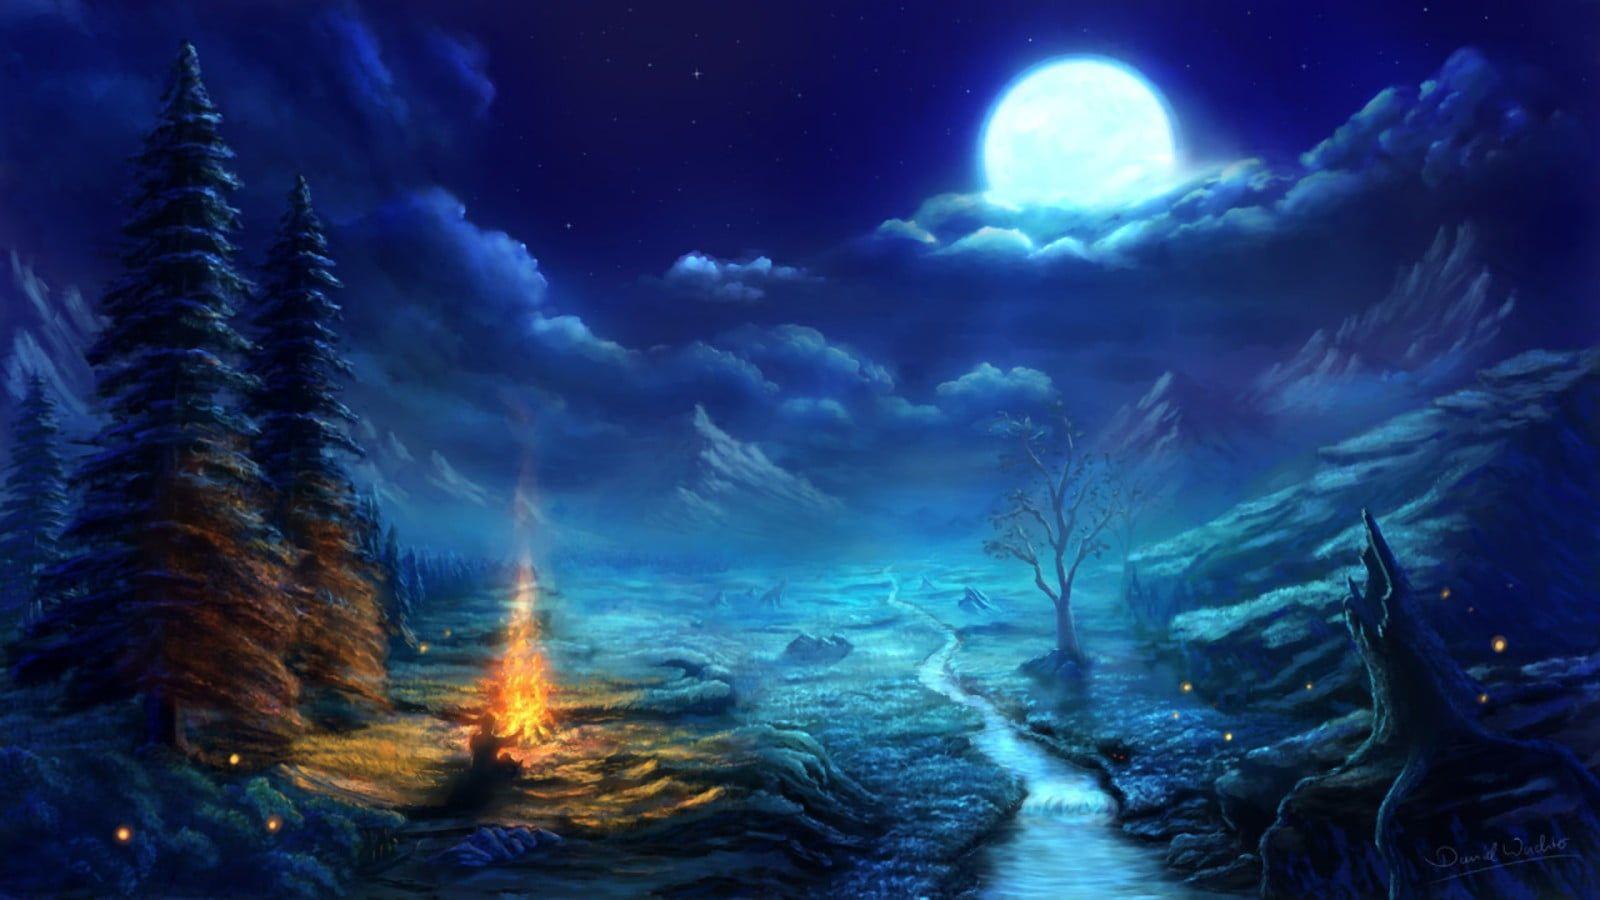 Image Result For Digital Art Nature Night Scenery Scenery Wallpaper Fantasy Landscape